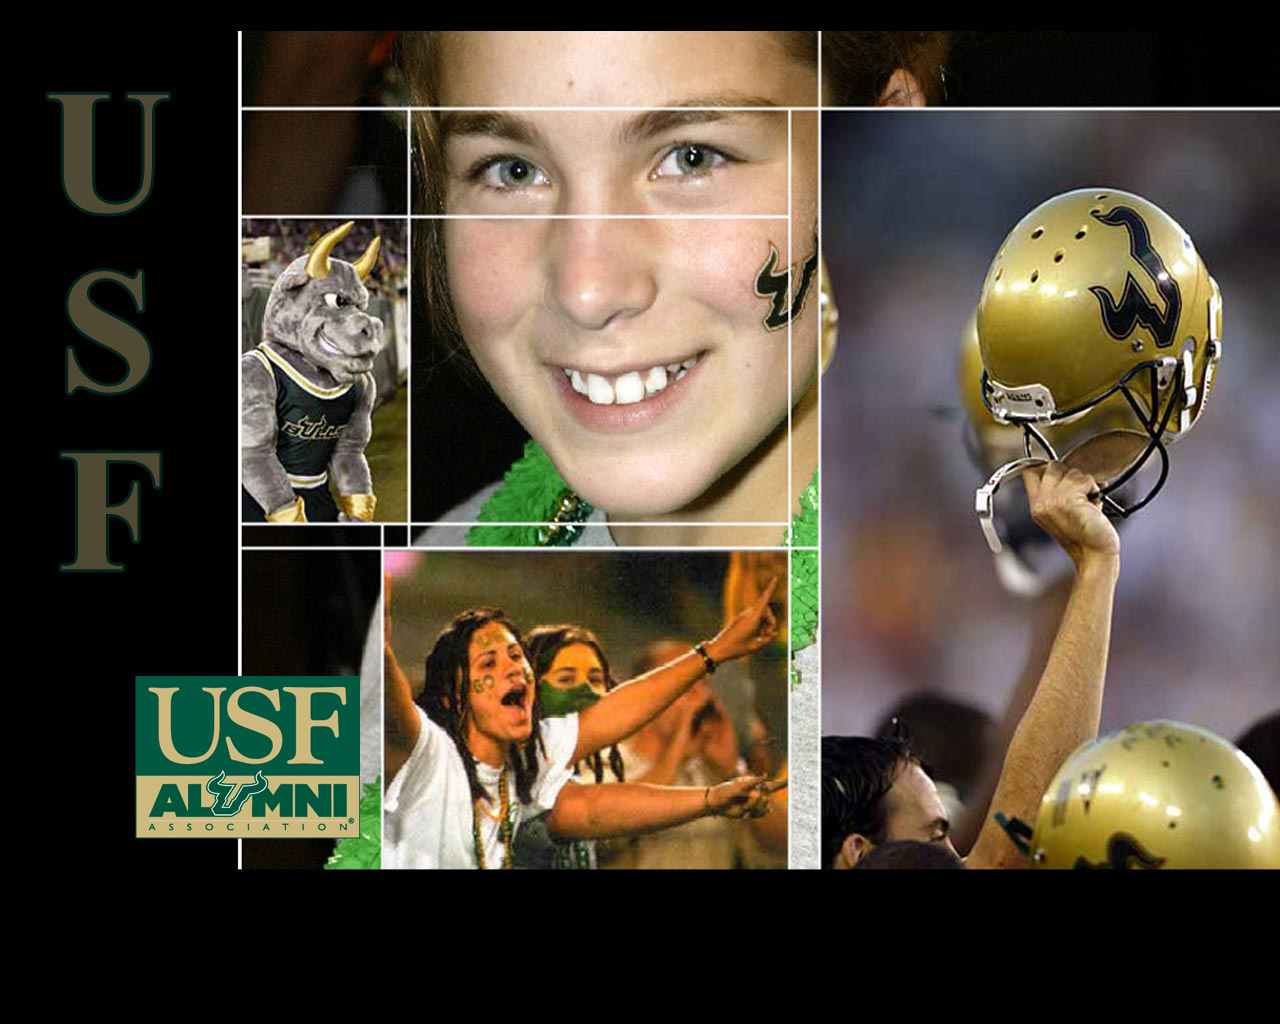 USF Alumni   USF Wallpaper 1280x1024